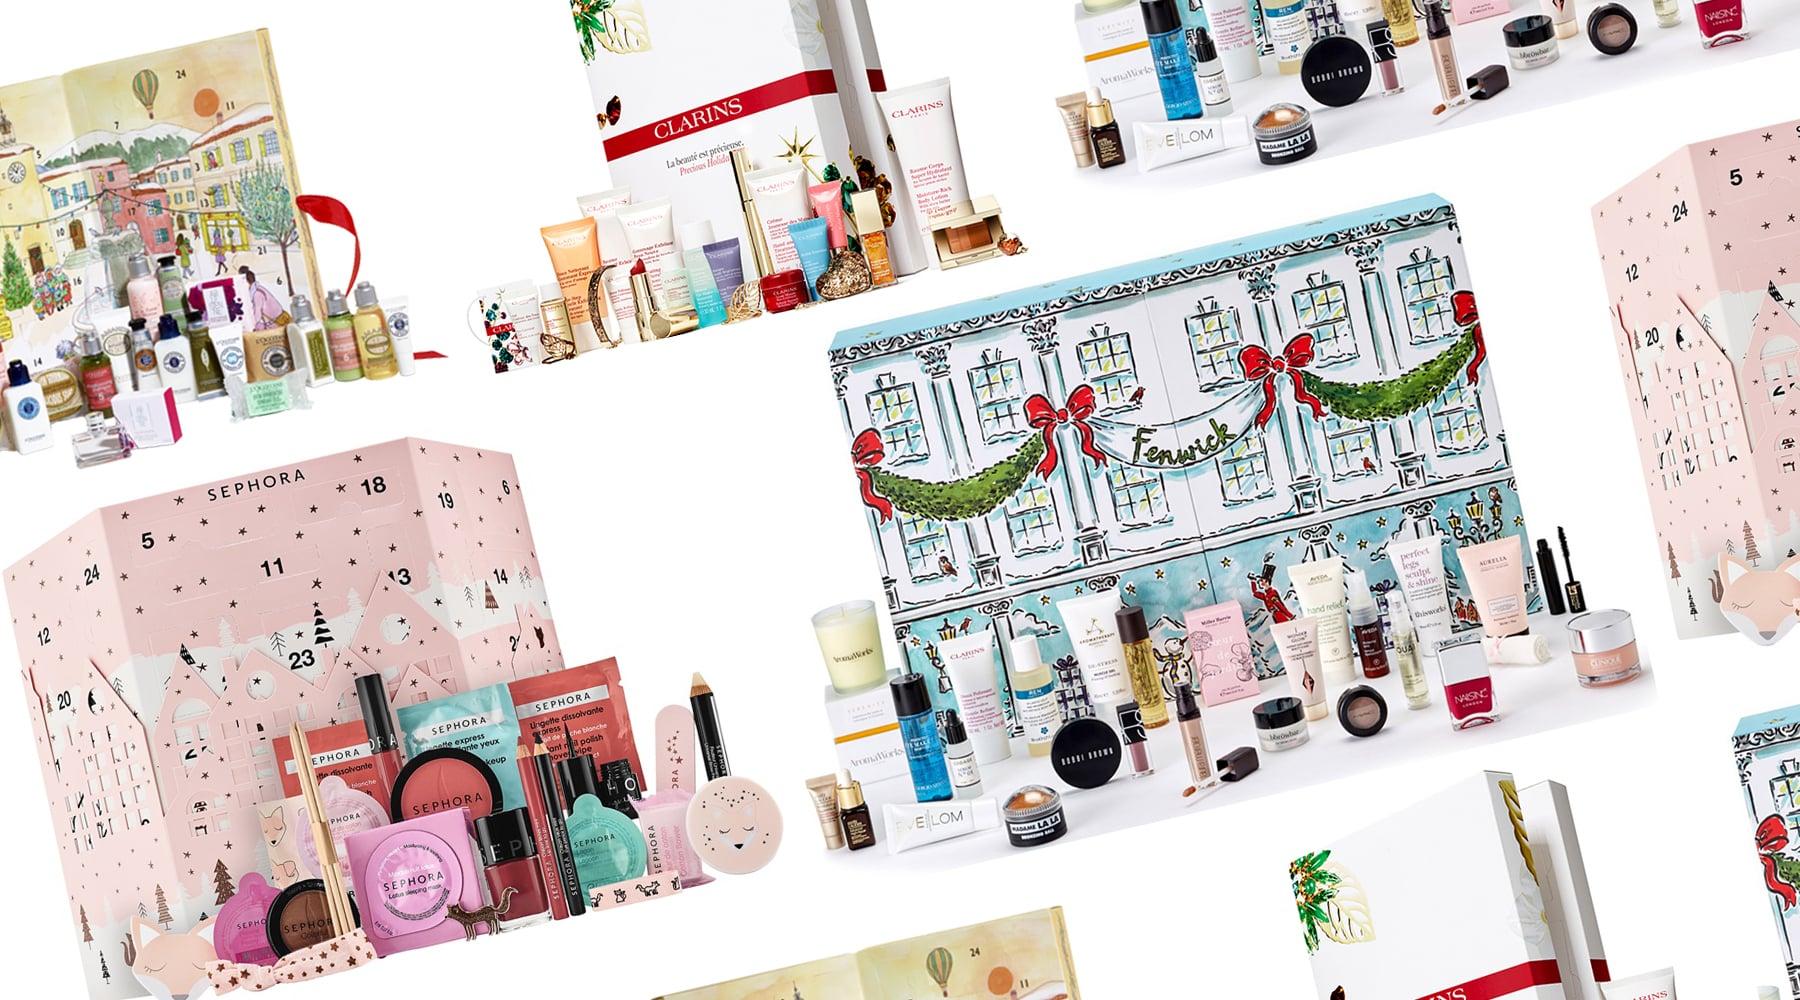 Calendario Avvento Beauty 2020.Calendario Dell Avvento Beauty Natale 2017 Ecco I Piu Belli